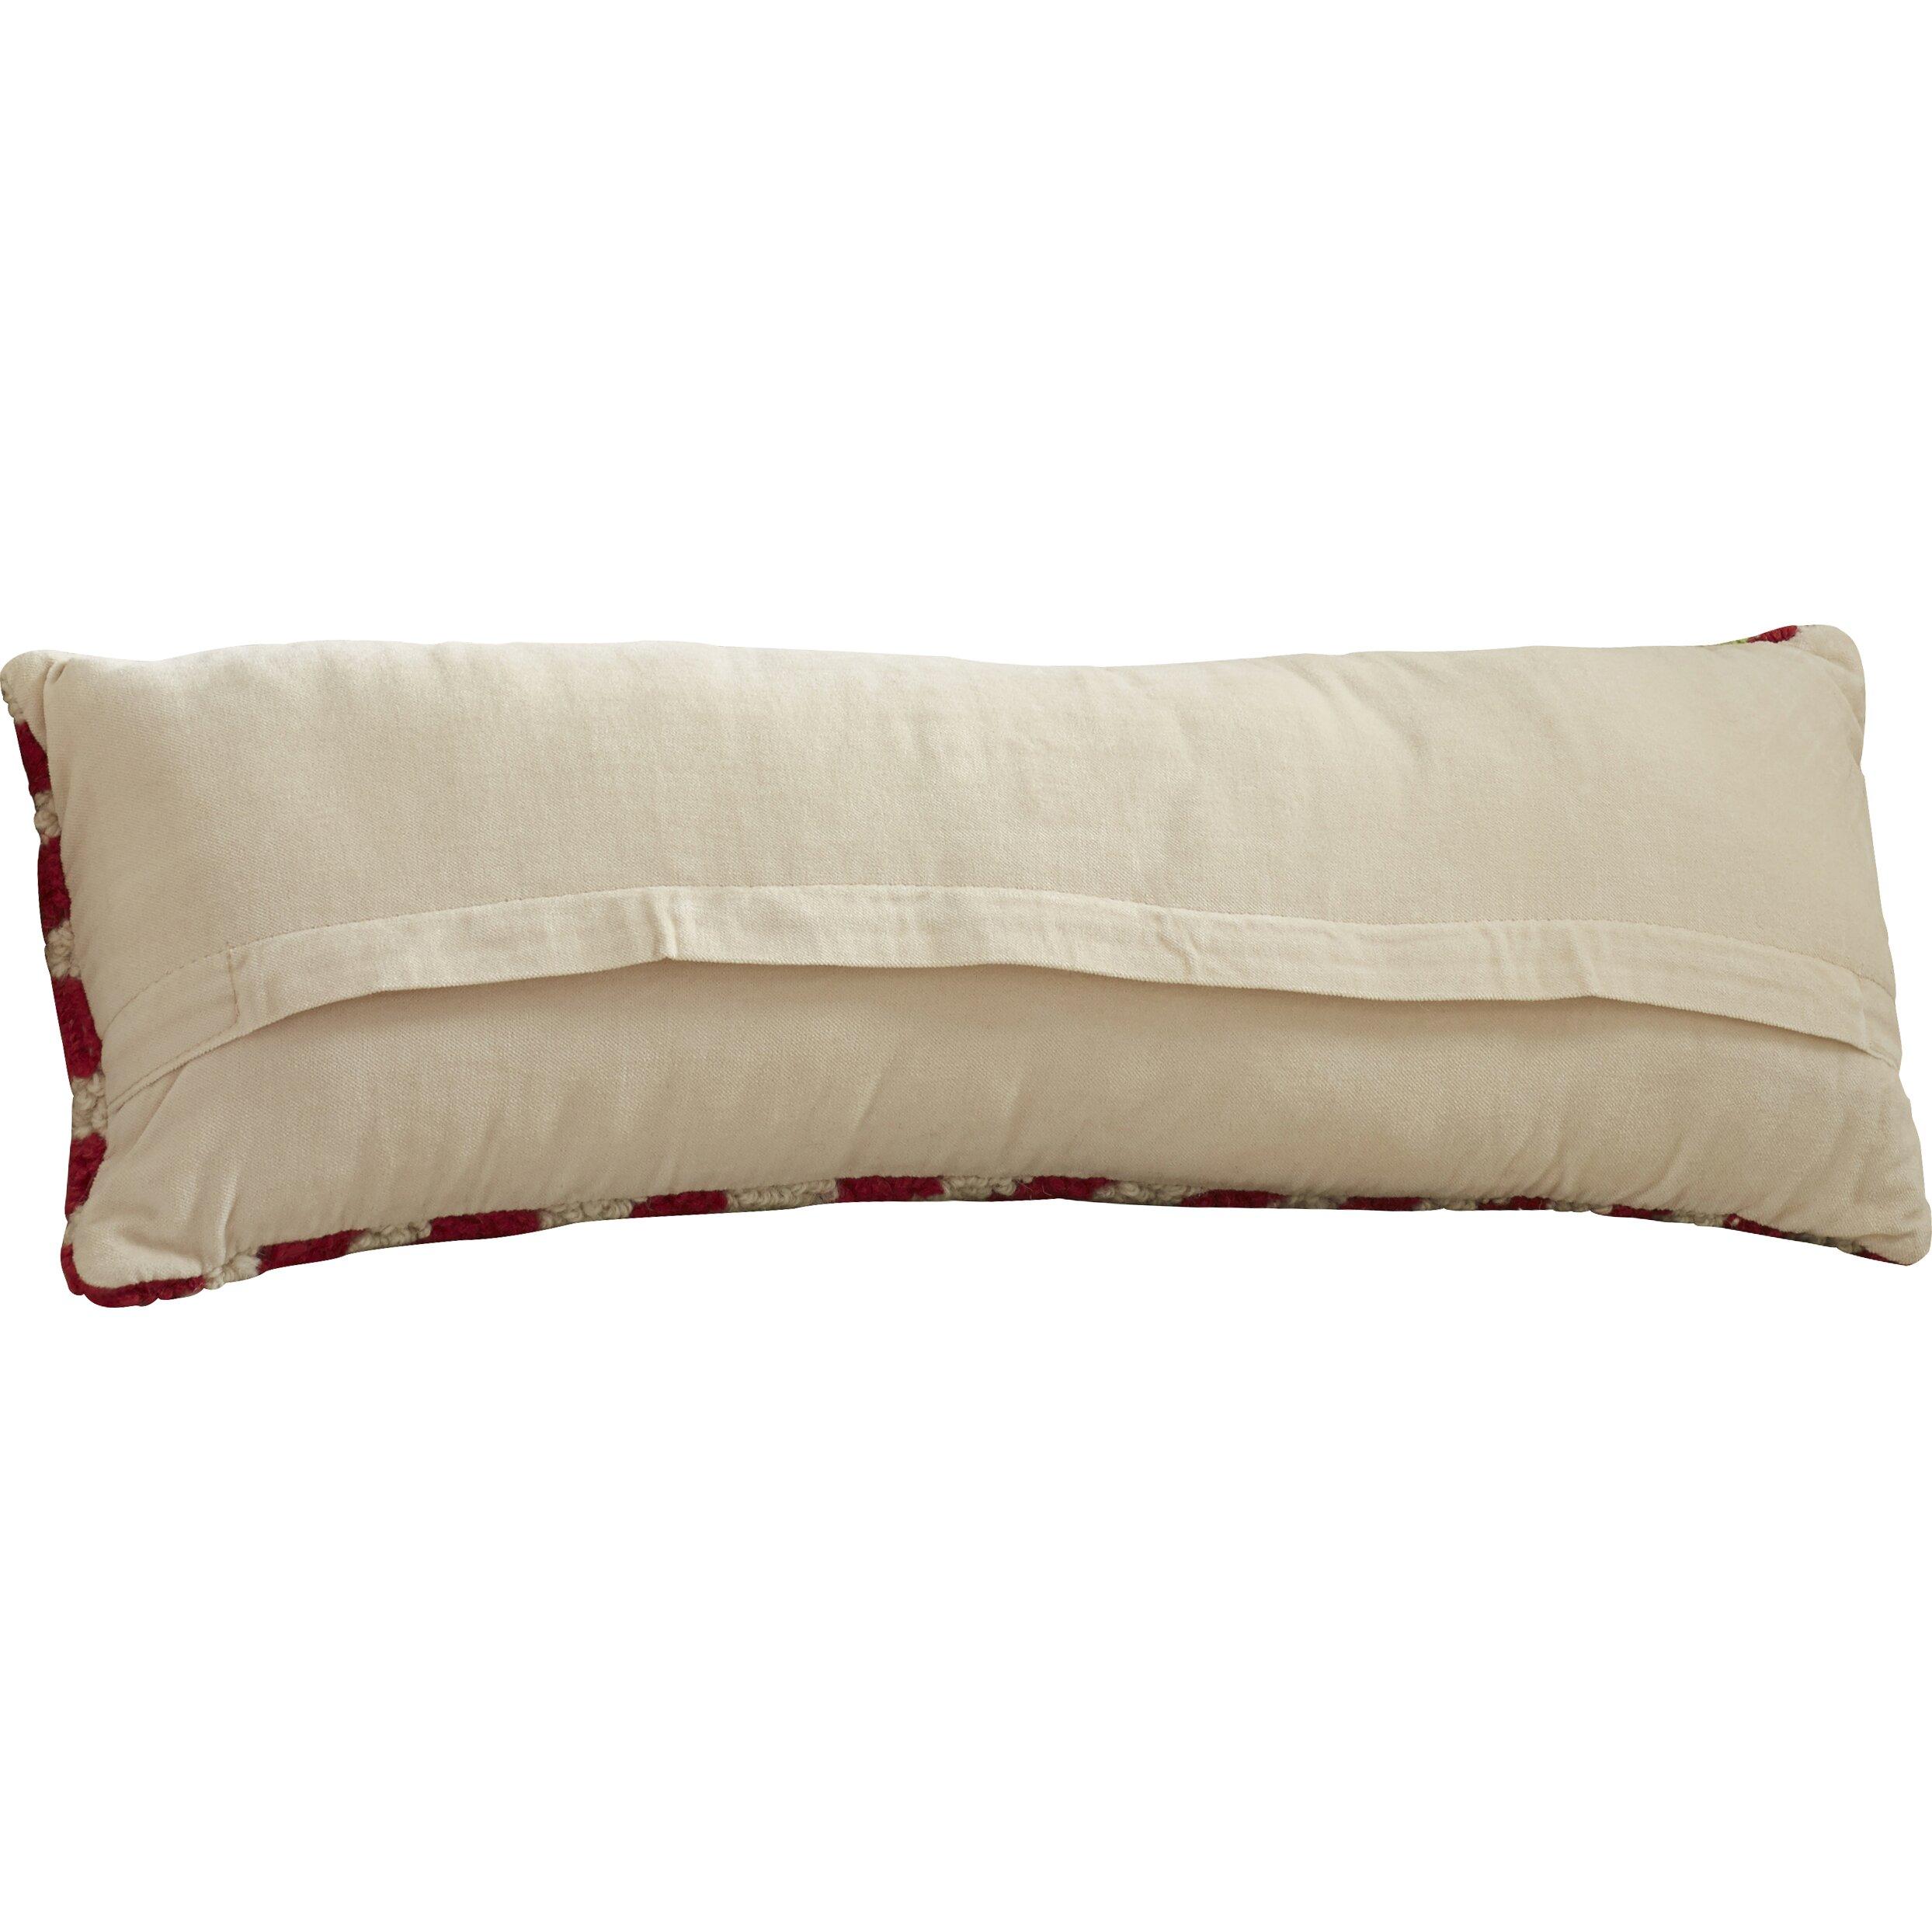 Joy Throw Pillow : Three Posts Fellsburg Joy Hook Wool Throw Pillow & Reviews Wayfair